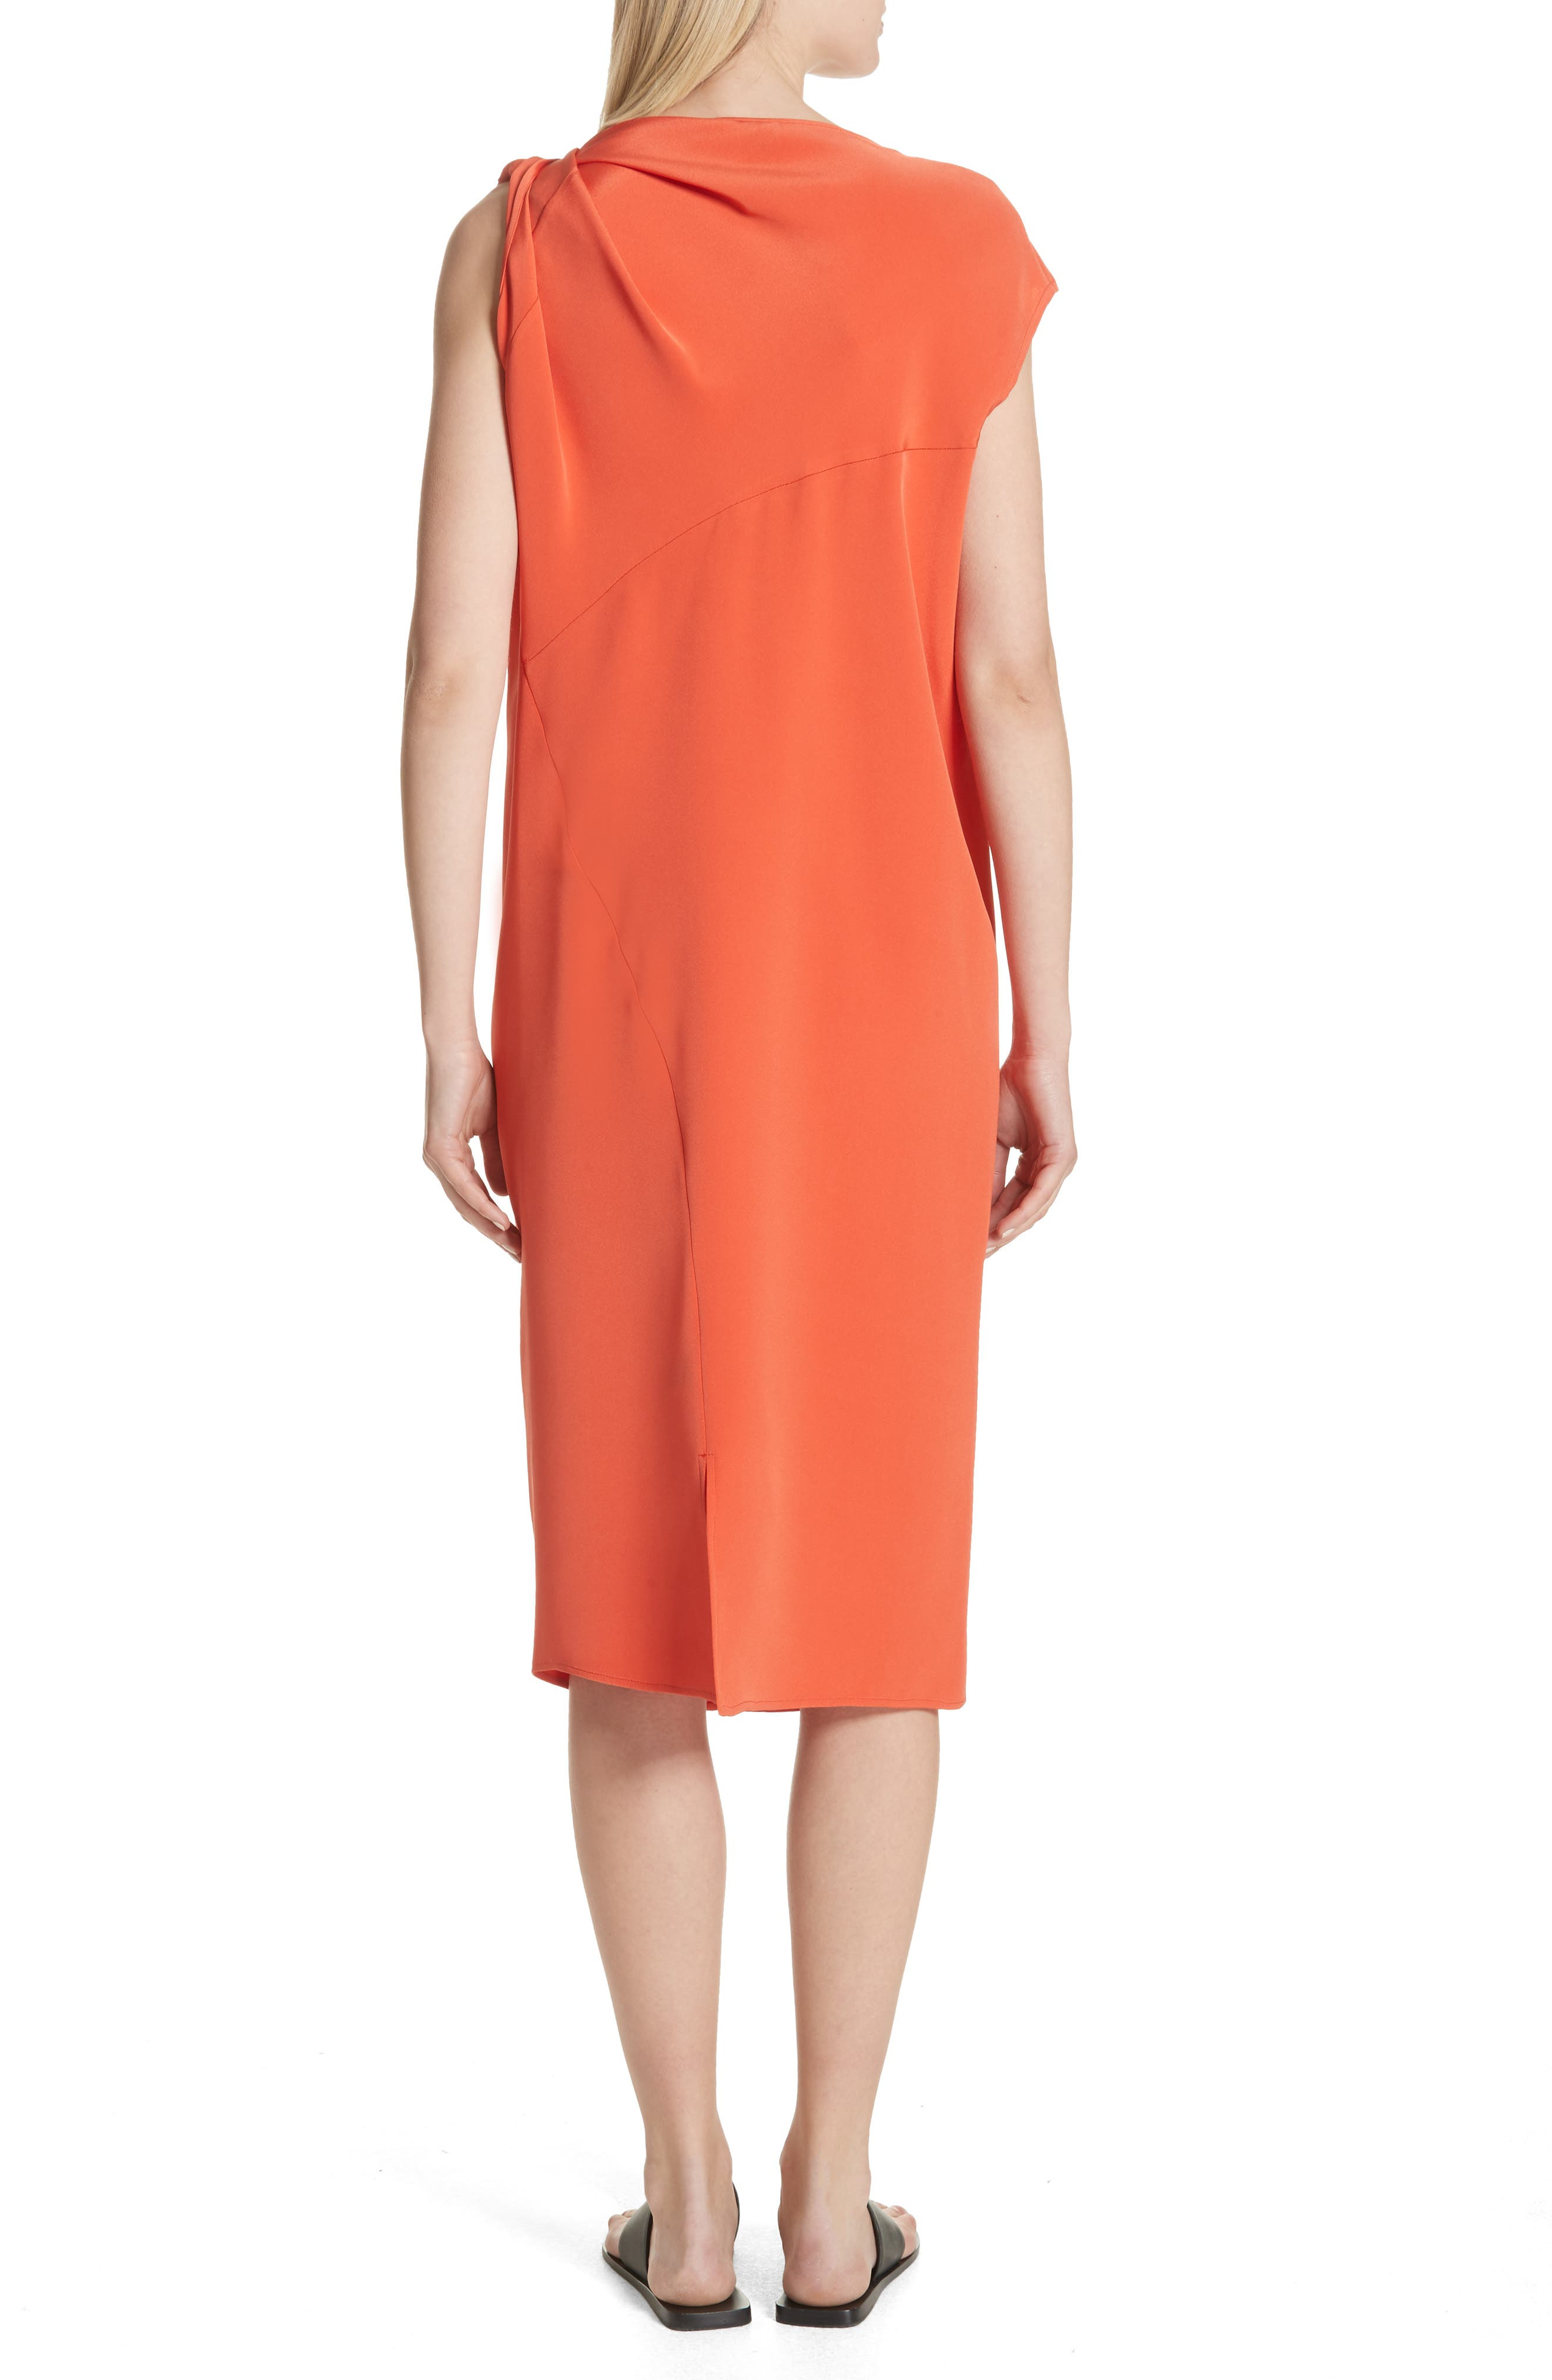 Twist Detail Silk Dress,                             Alternate thumbnail 2, color,                             Persimmon Orange